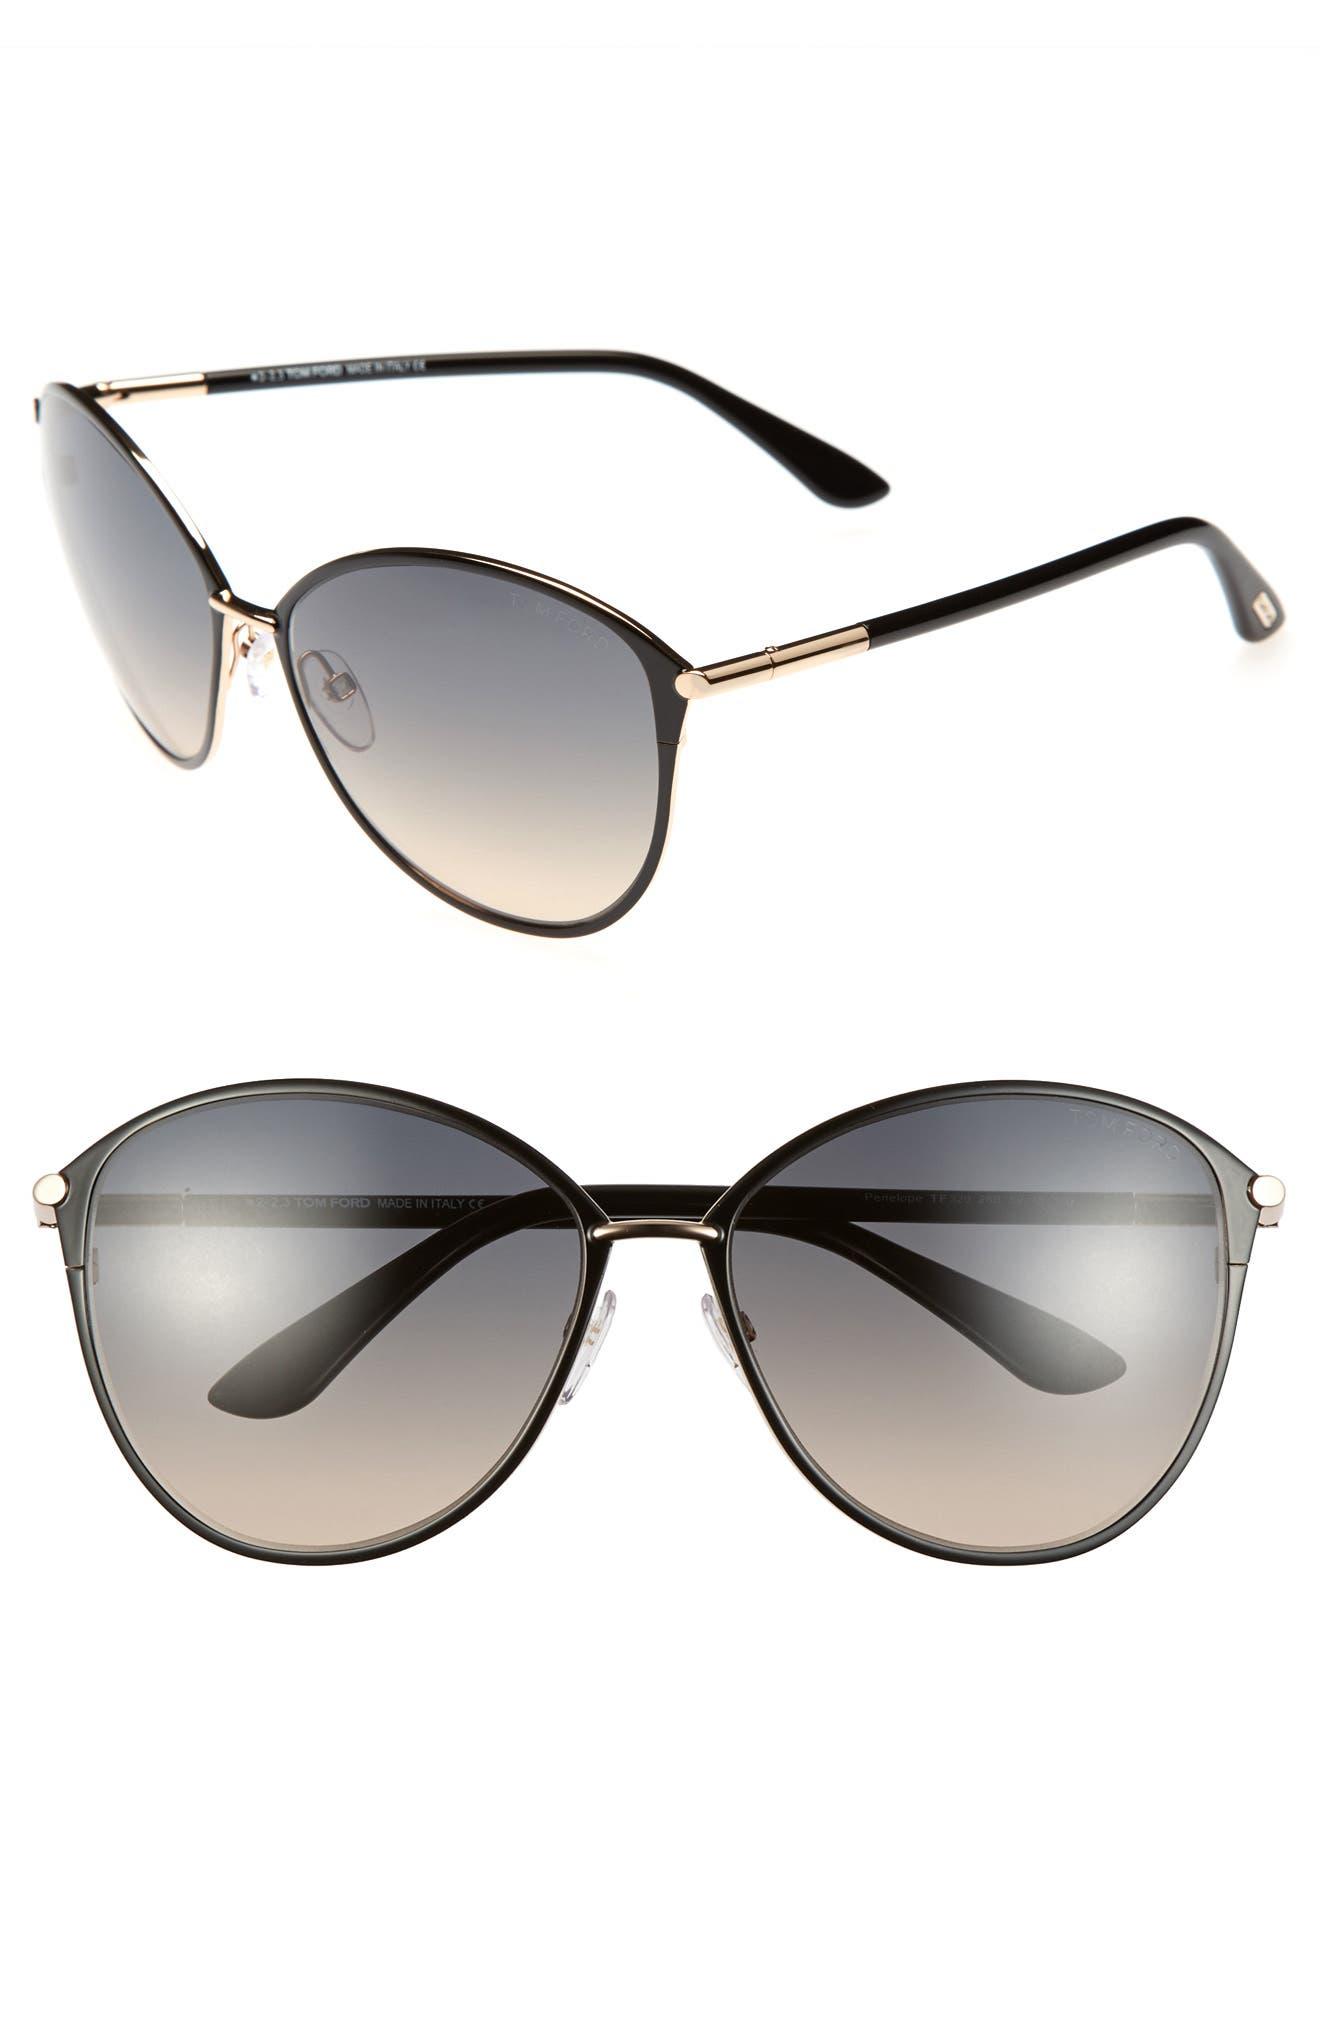 Penelope 59mm Gradient Cat Eye Sunglasses,                         Main,                         color, SHINY ROSE GOLD/ BLACK